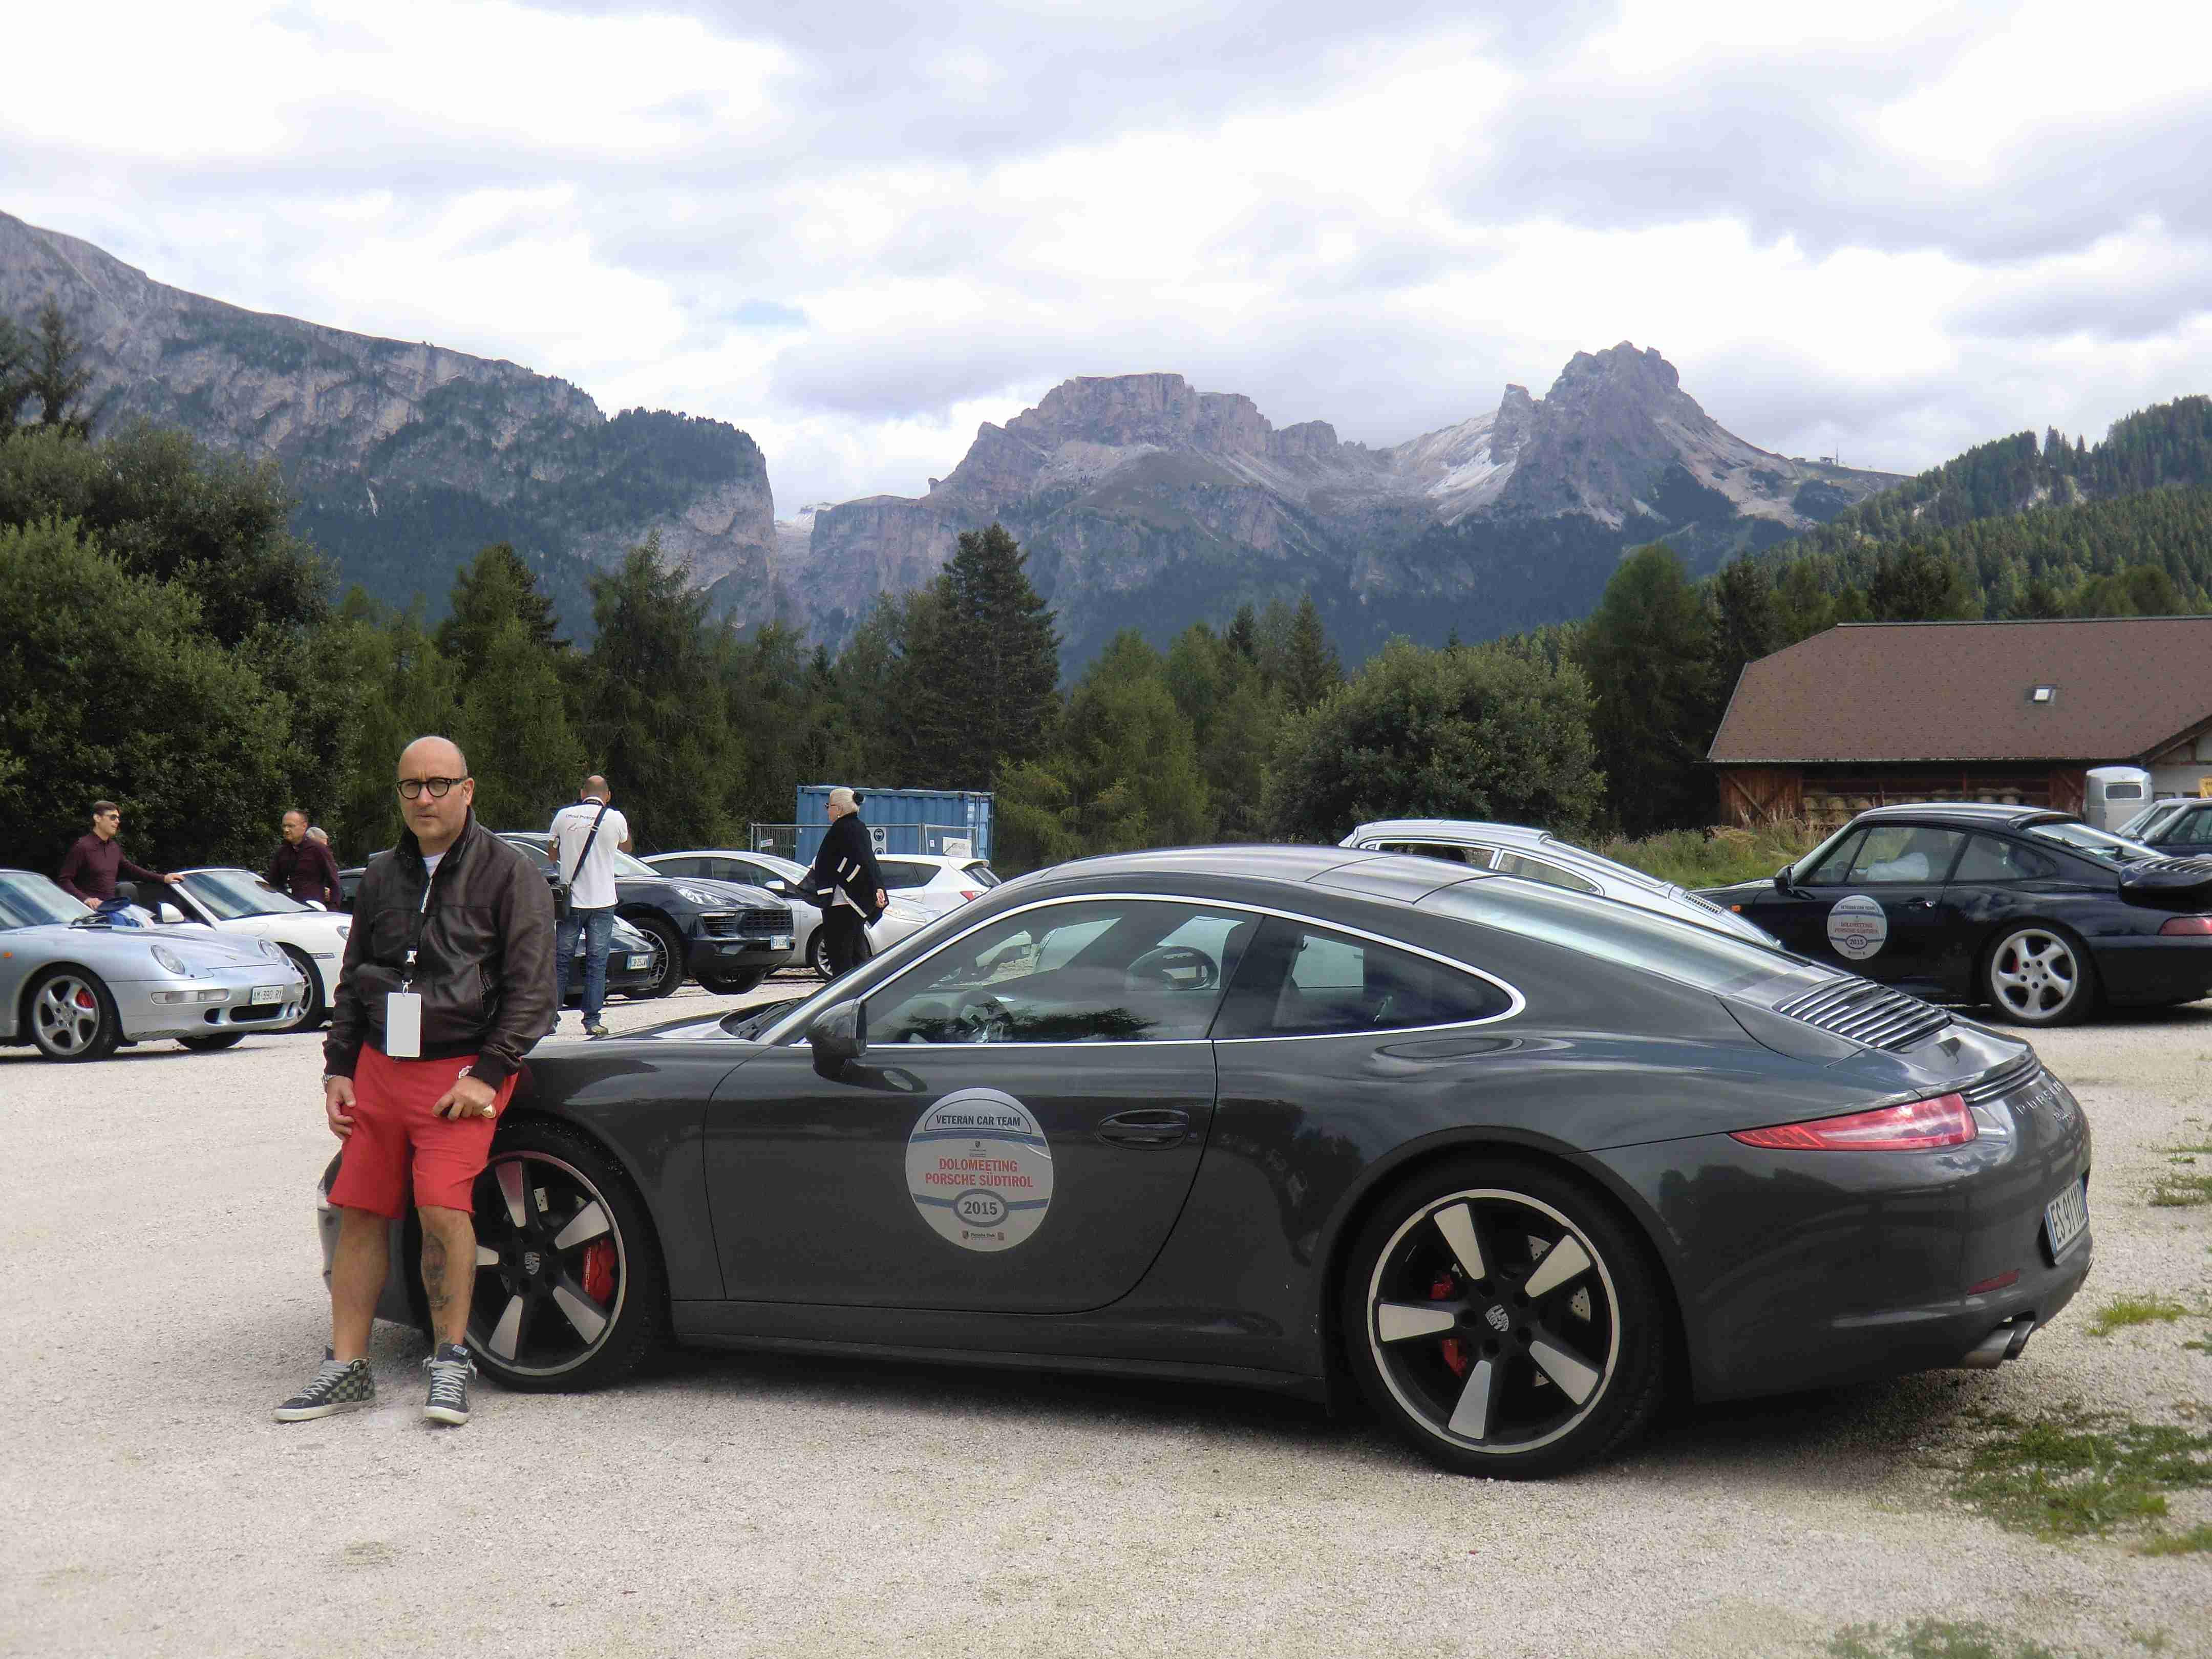 Dolomeeting Porsche Sudtirol seconda parte